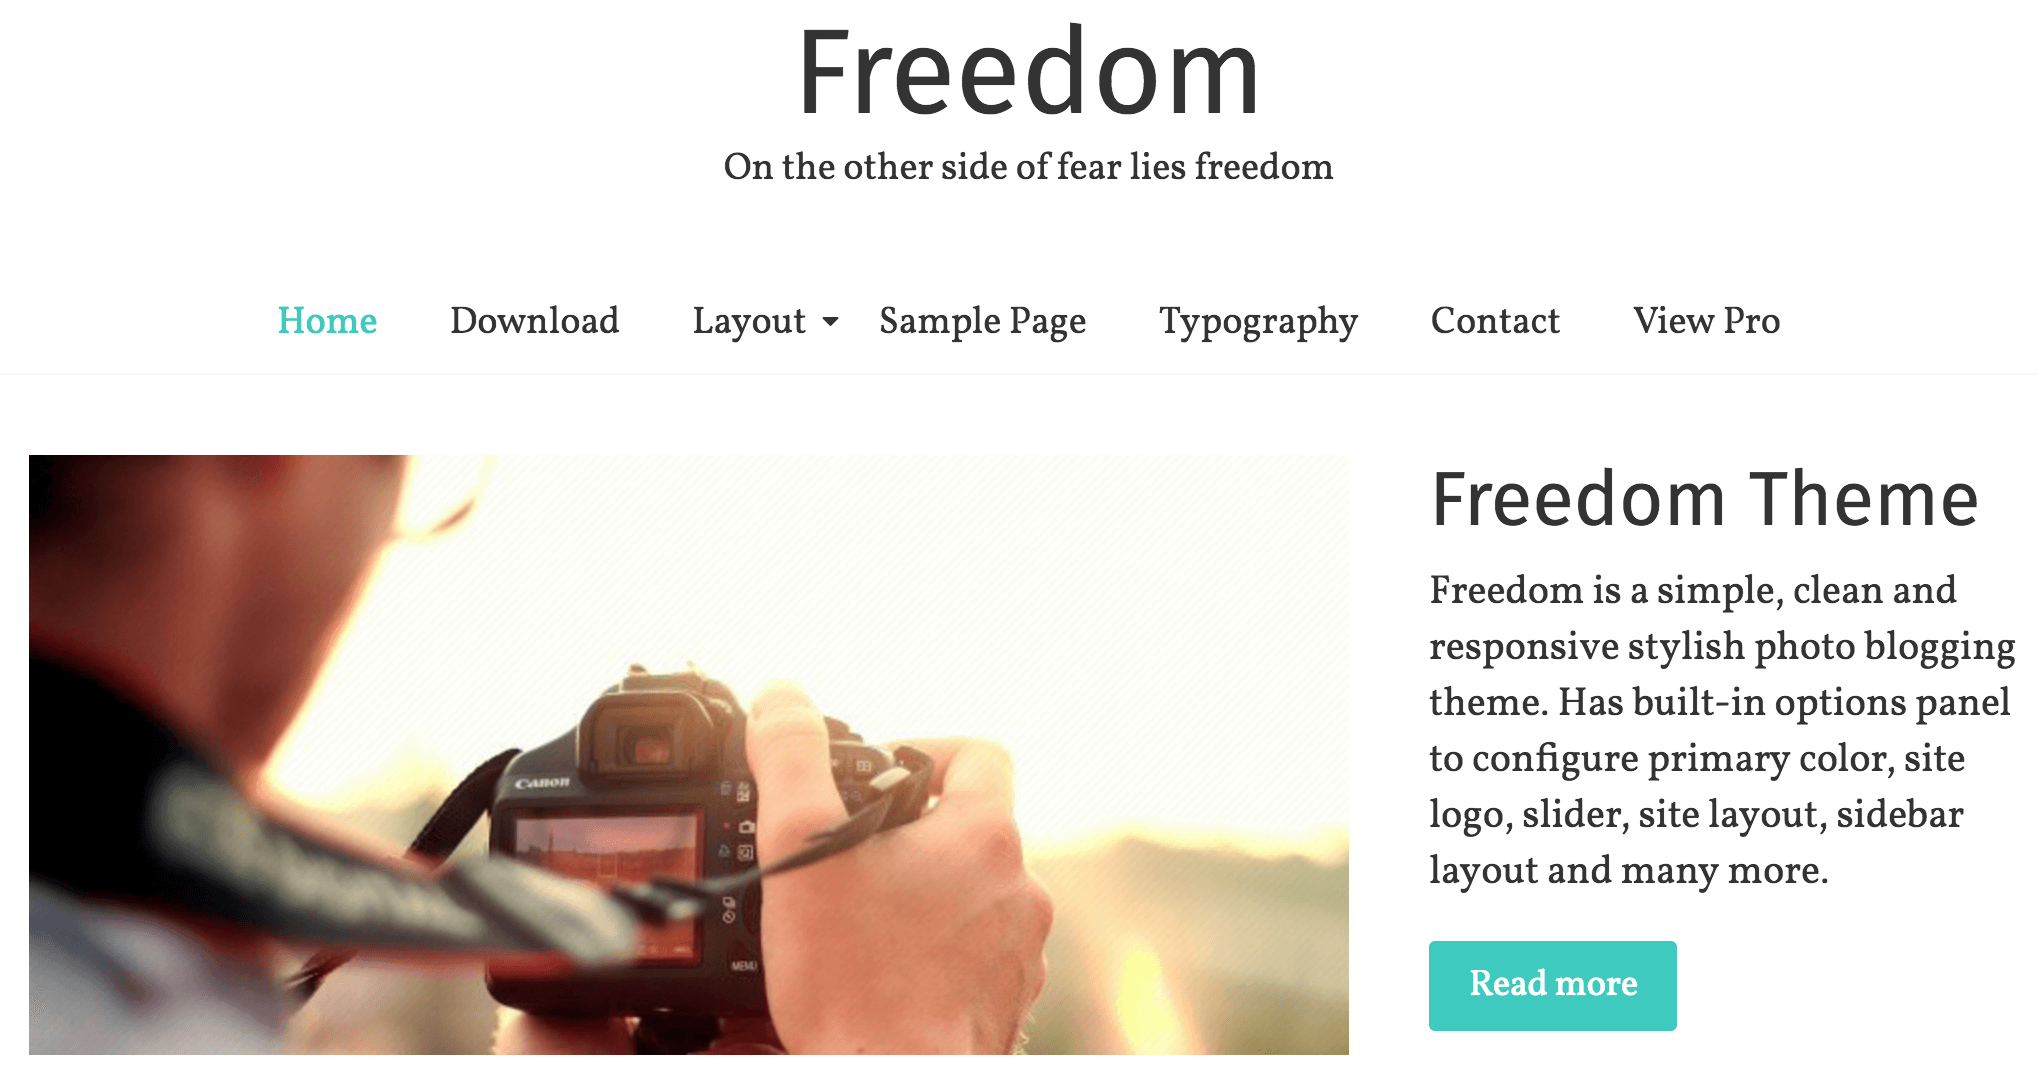 The Freedom theme.